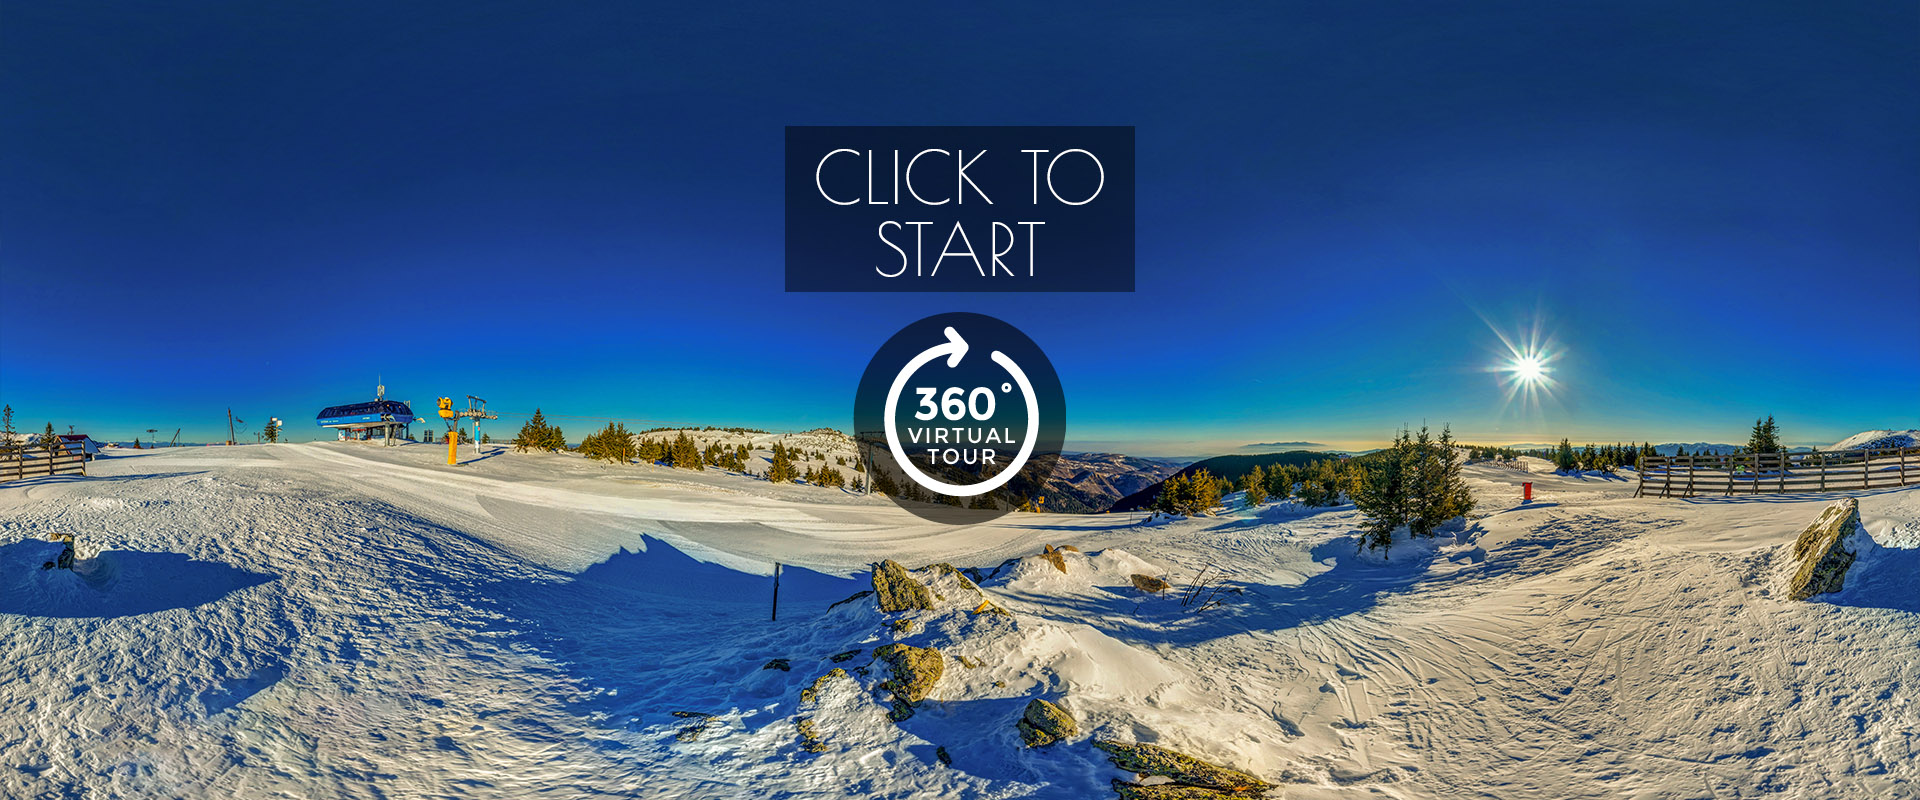 hdr_headher_360_winter